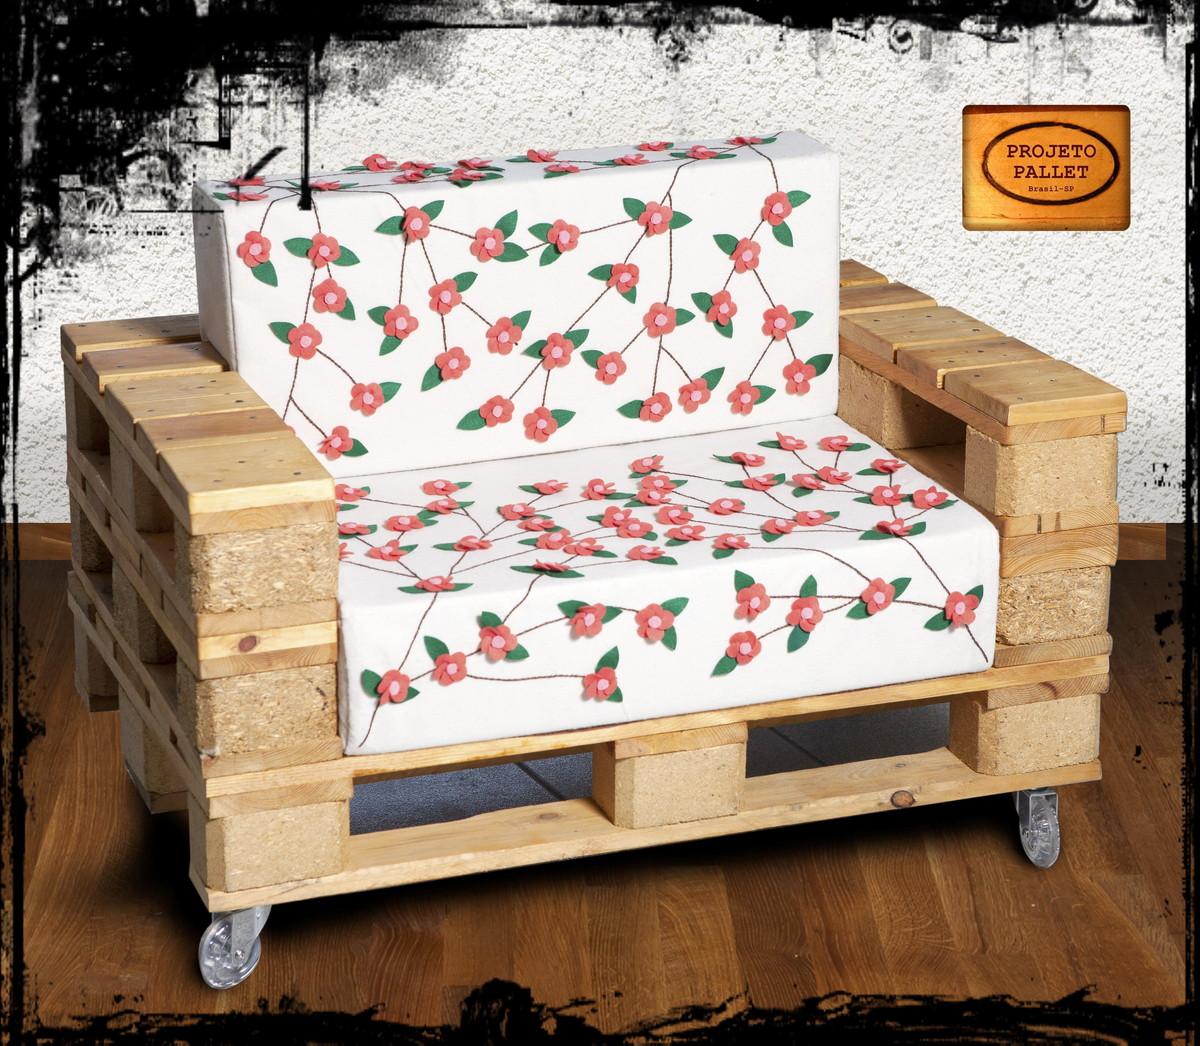 de madeira poltrona em pallet mega artesanal poltrona de madeira  #A96422 1200x1046